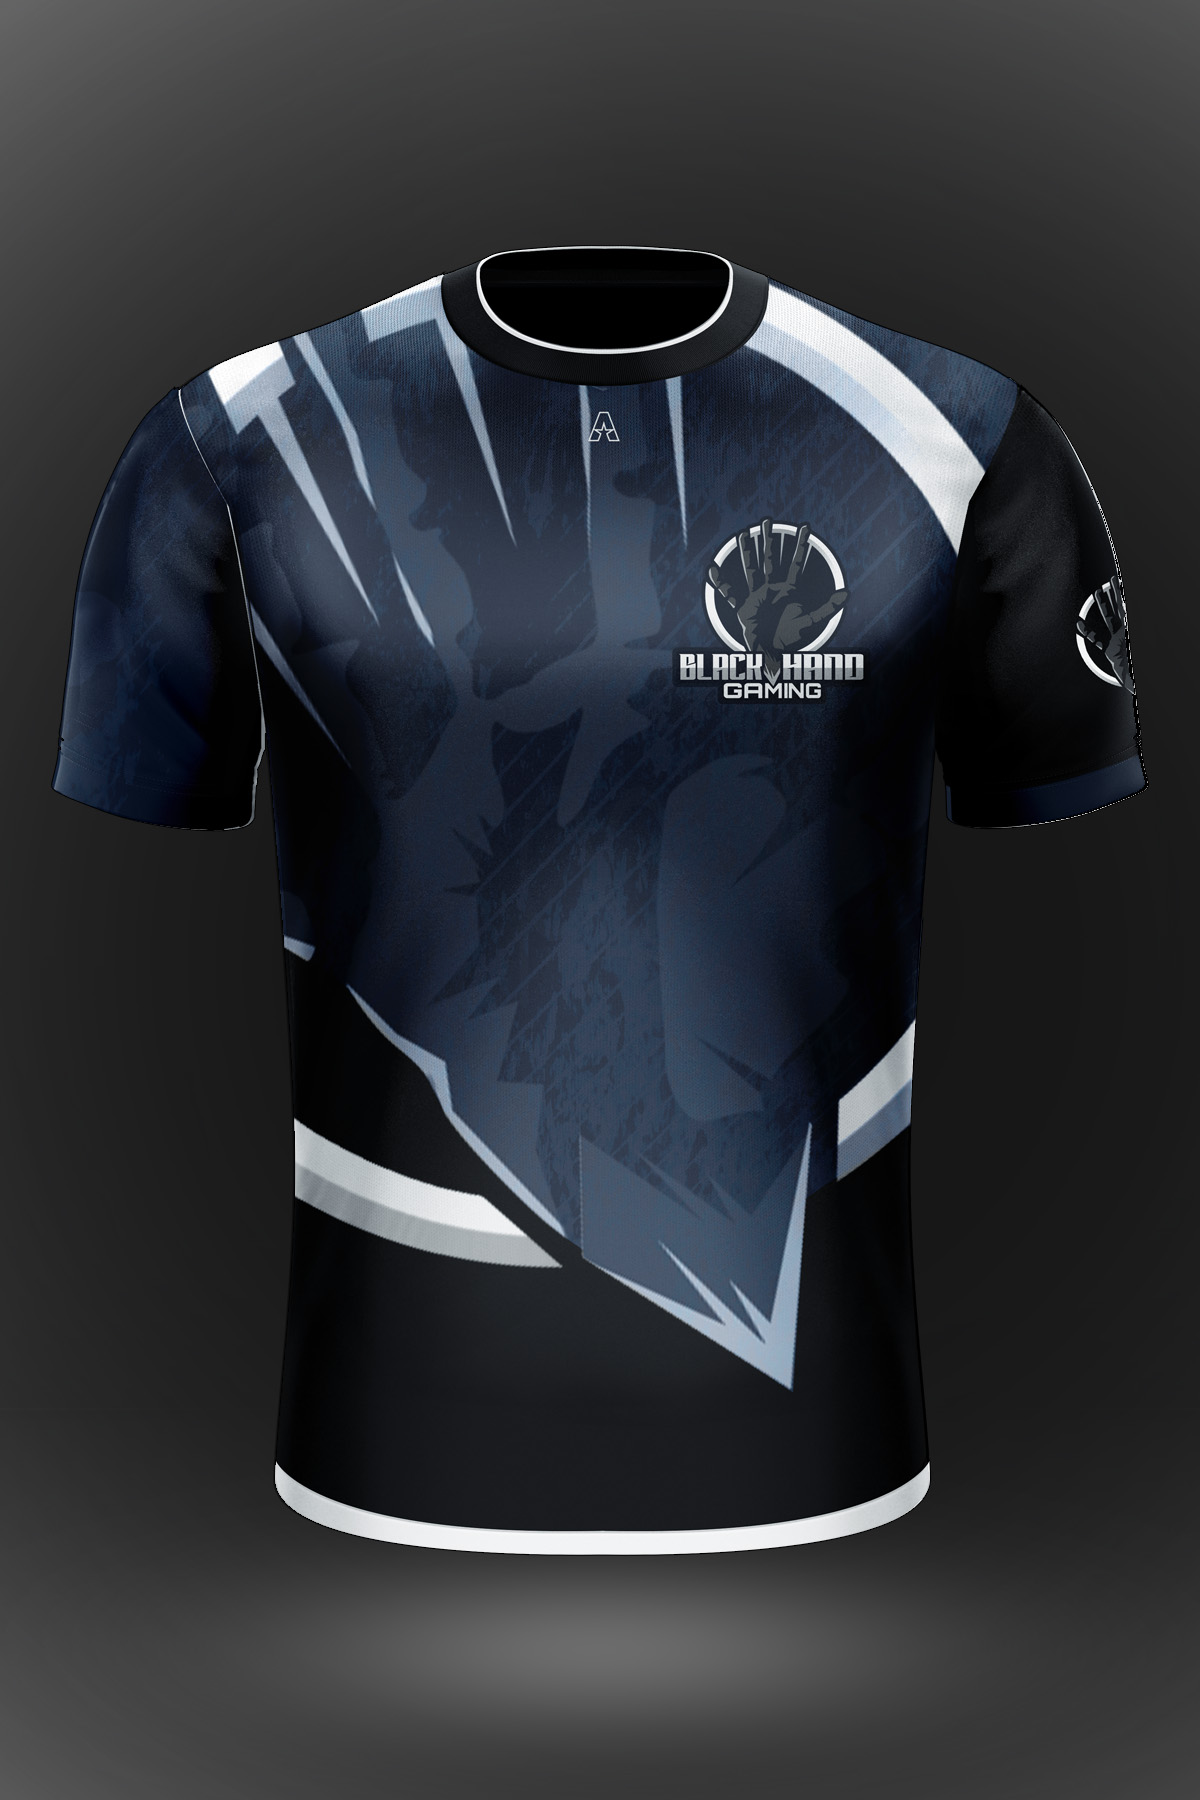 84b03c57 Black Hand Gaming Jersey